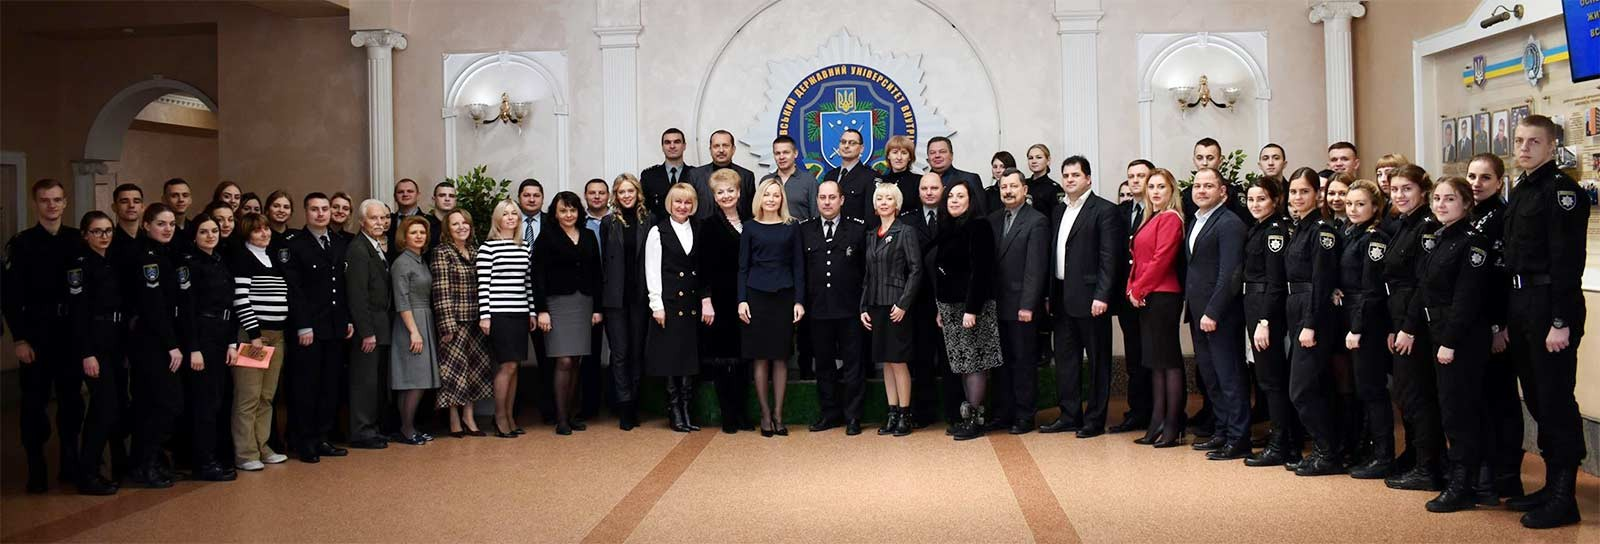 Всеукраїнська науково-практичну конференція